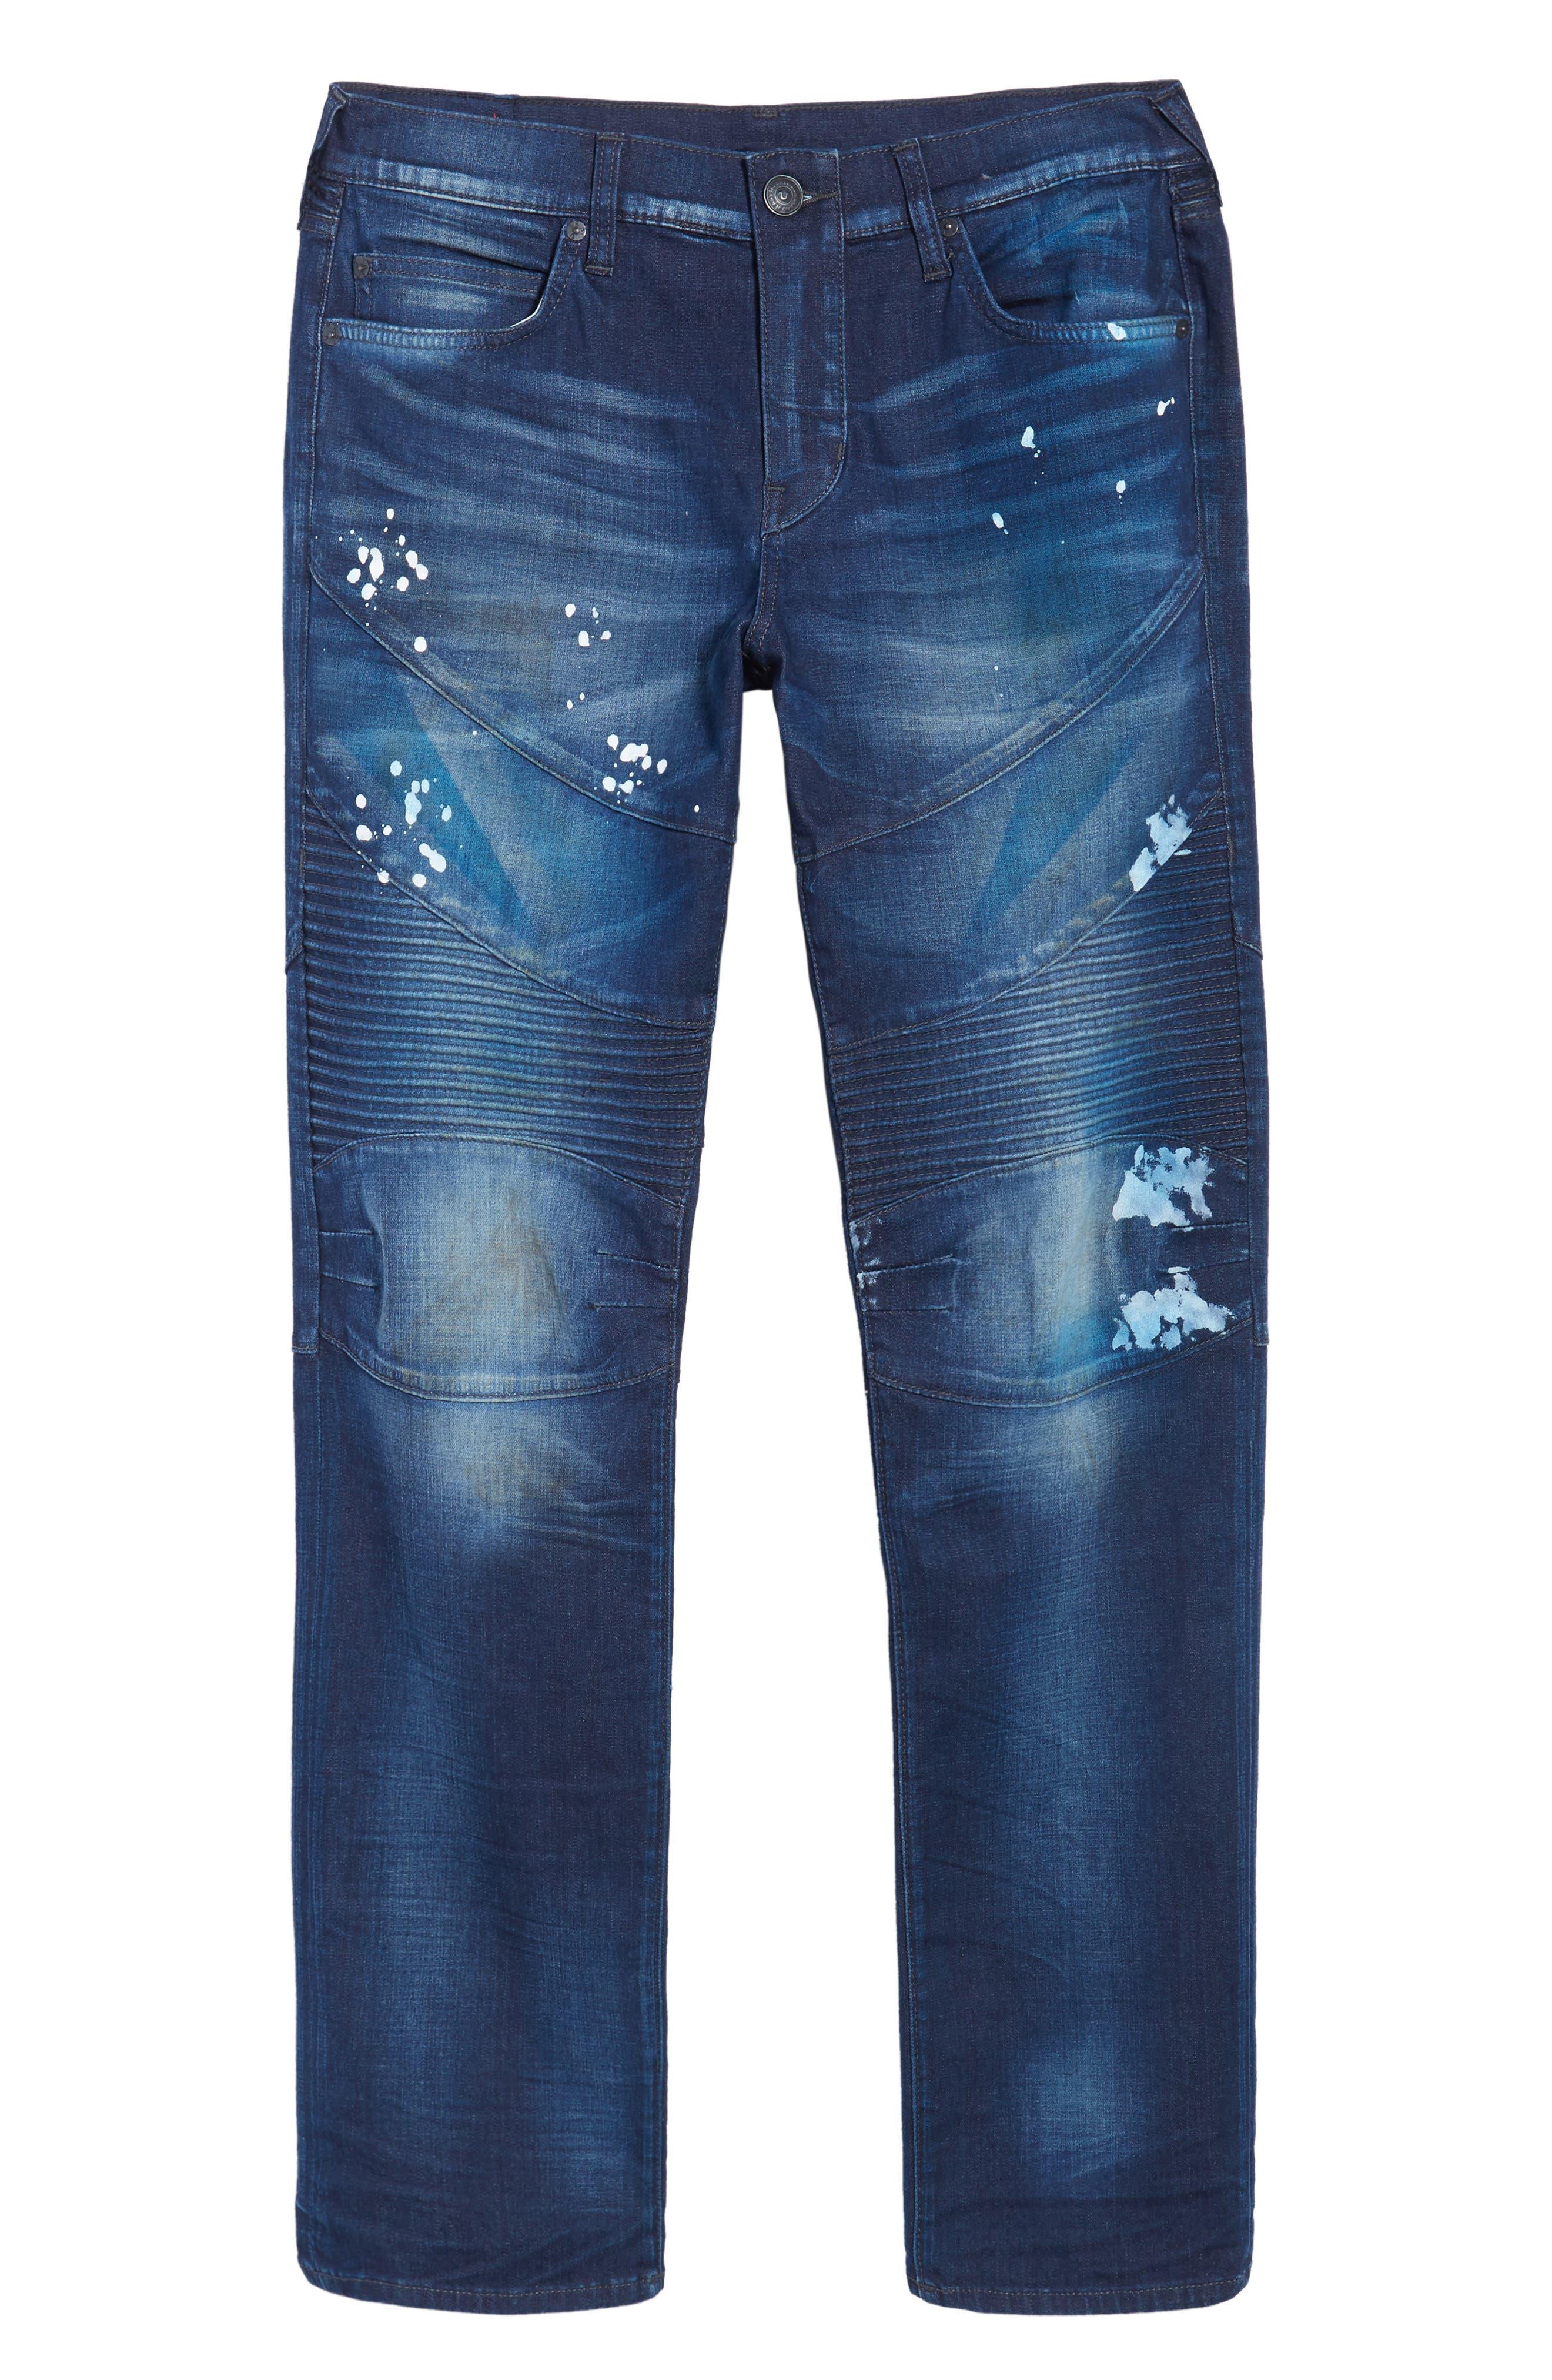 Geno Straight Leg Jeans,                             Alternate thumbnail 6, color,                             FRAGMENT SHADOW